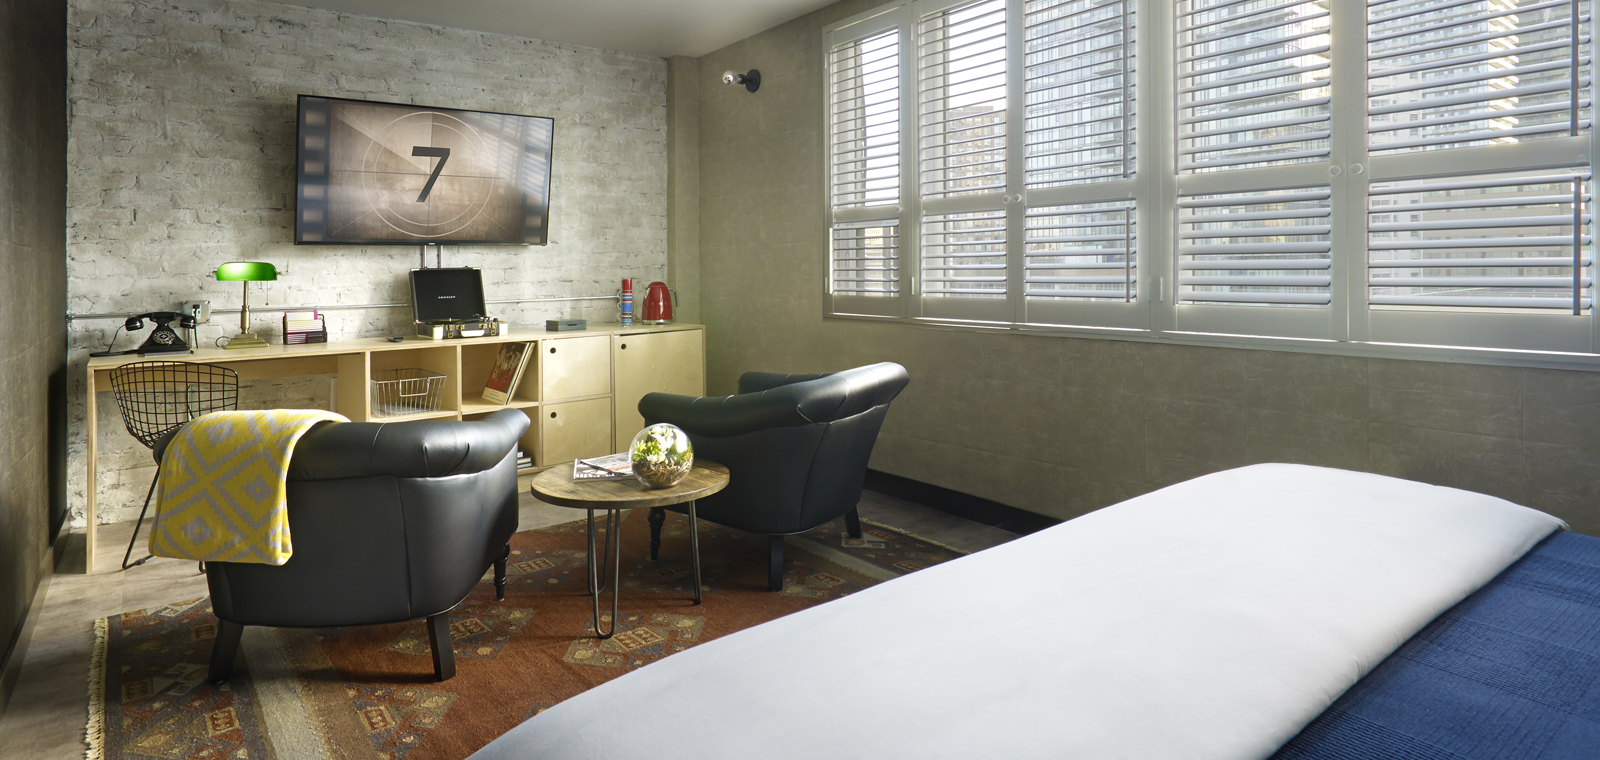 TORJD_P002_Corner_King_Studio_Room_Sitting_Area